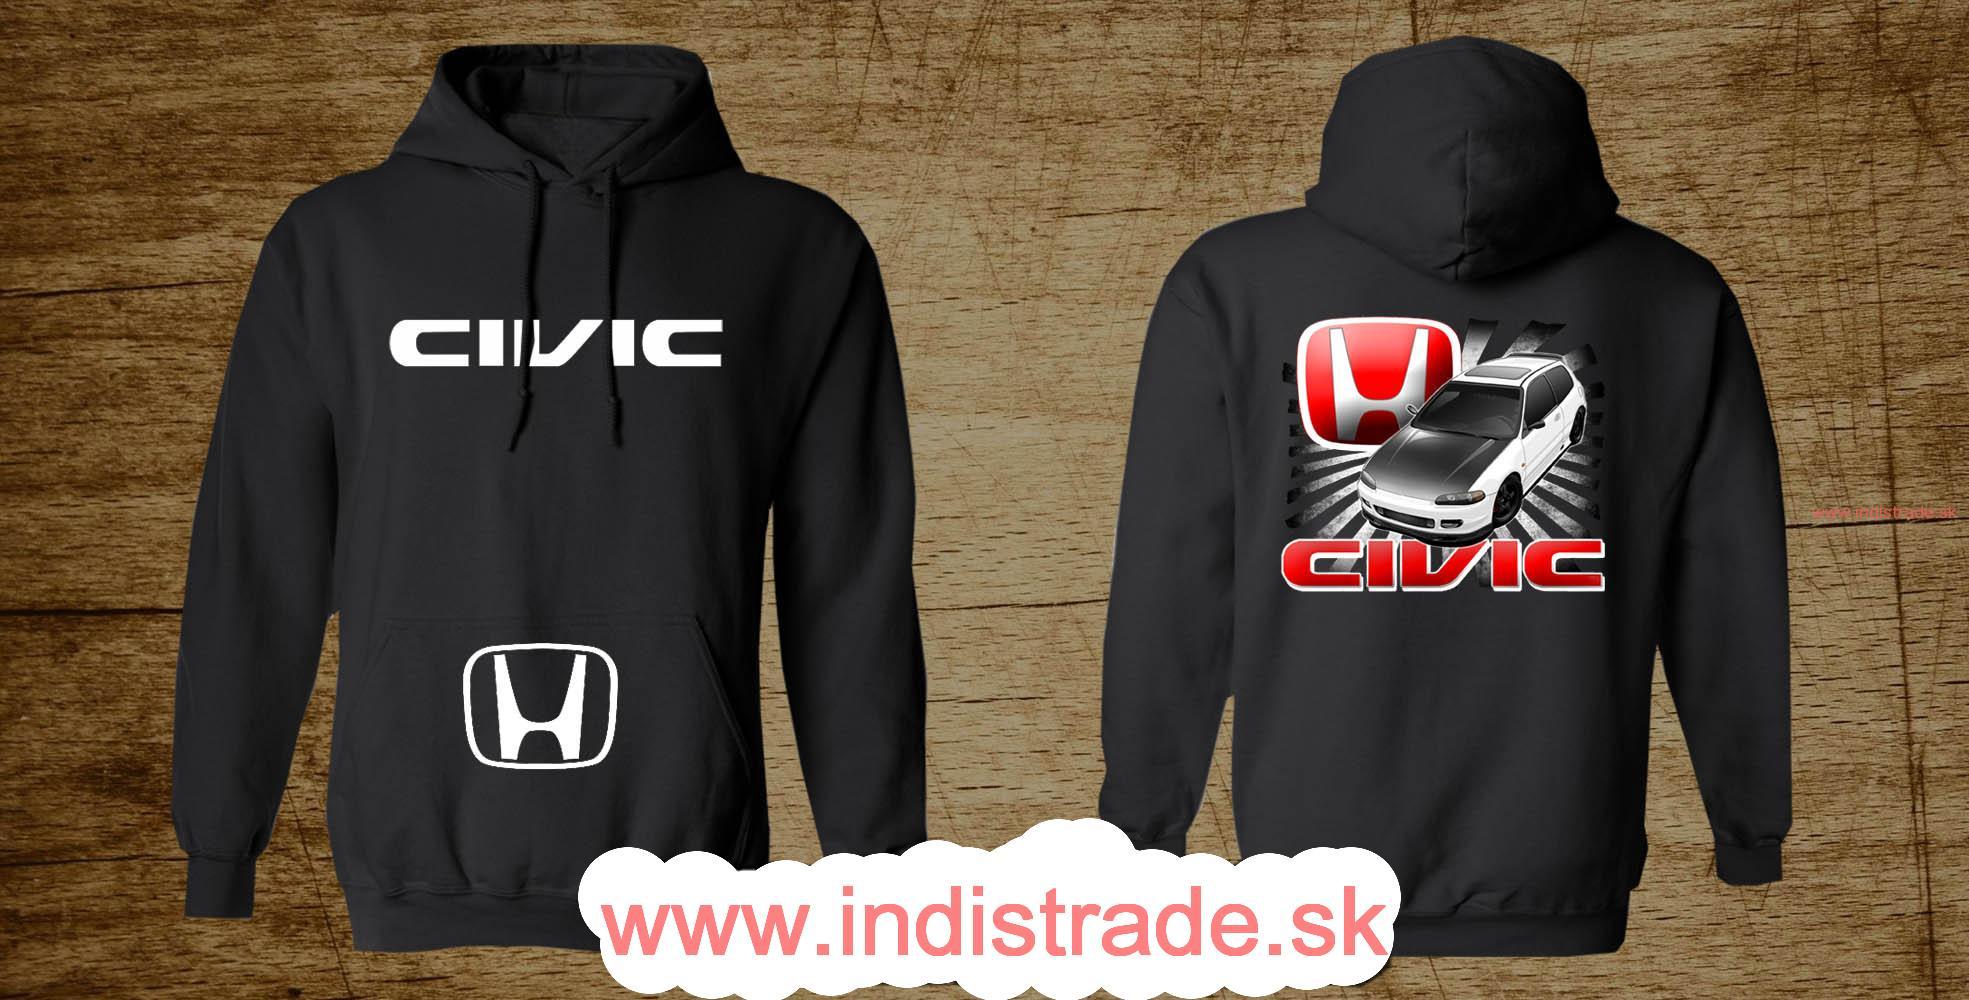 Mikina s kapucnou Honda Civic cf49630058b